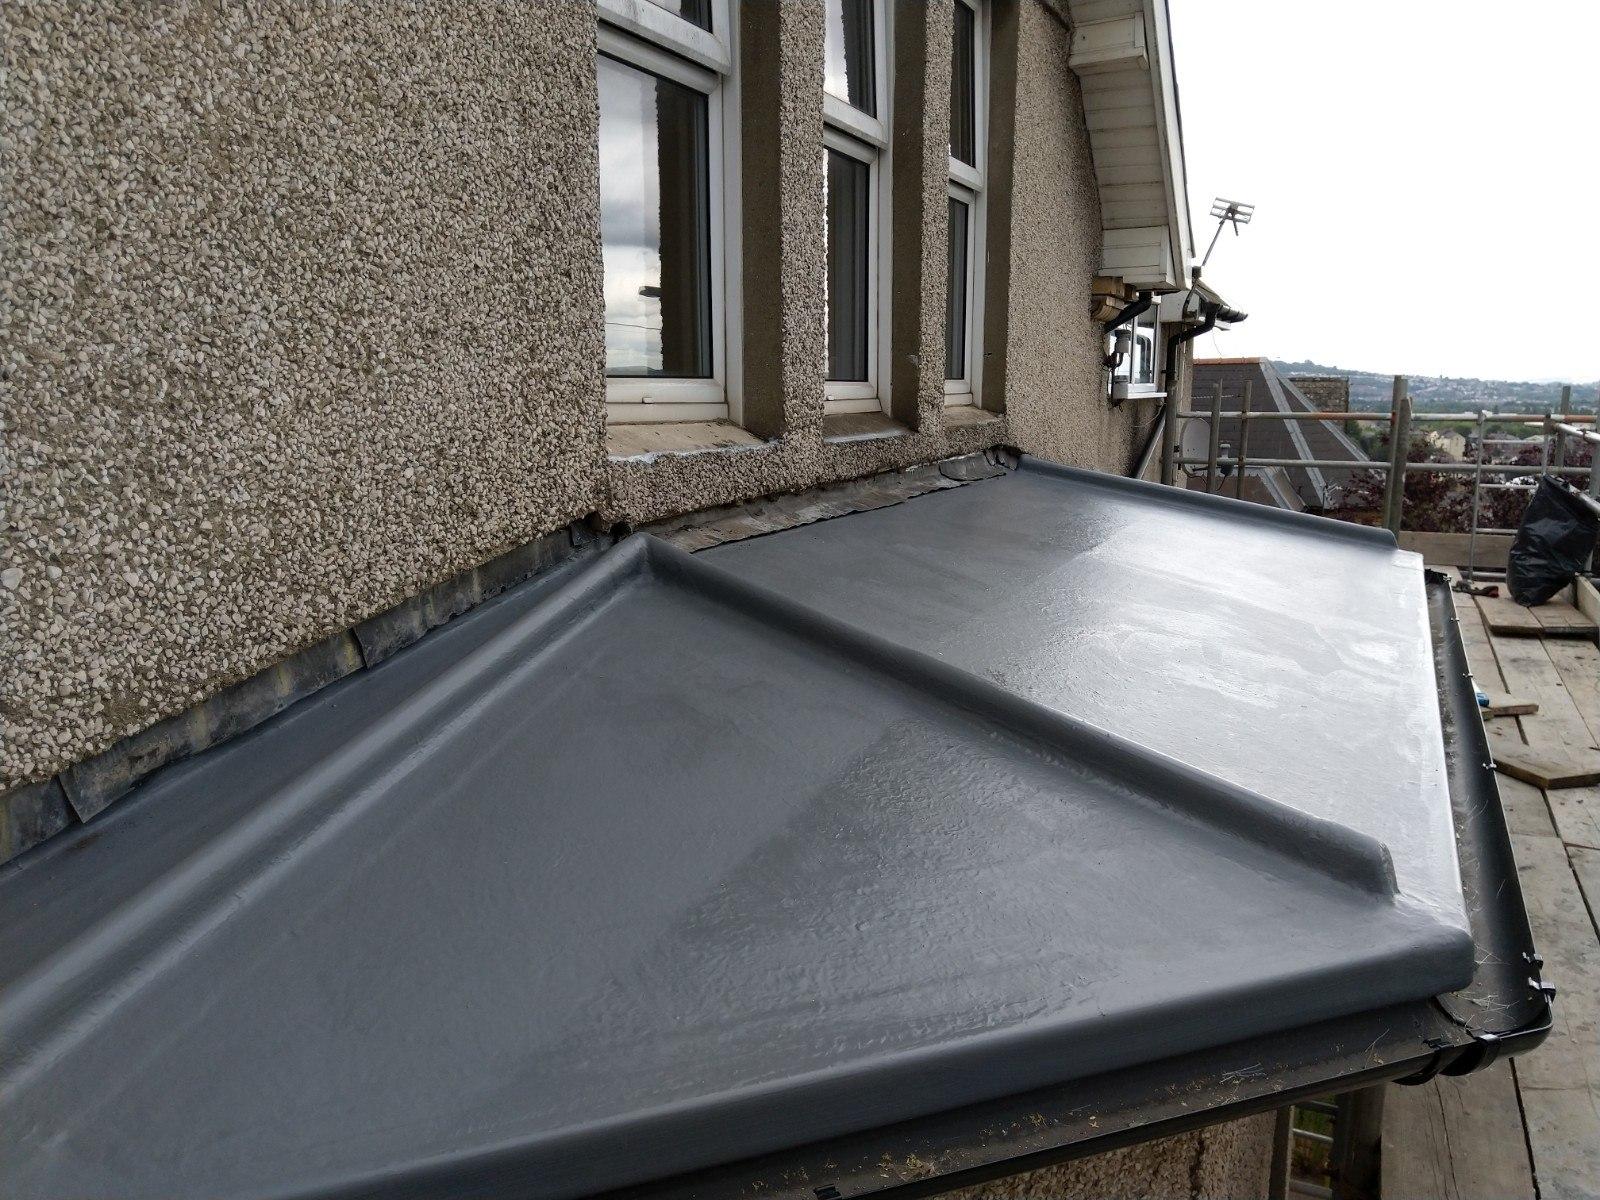 Bay window, imitation lead fibreglass roof